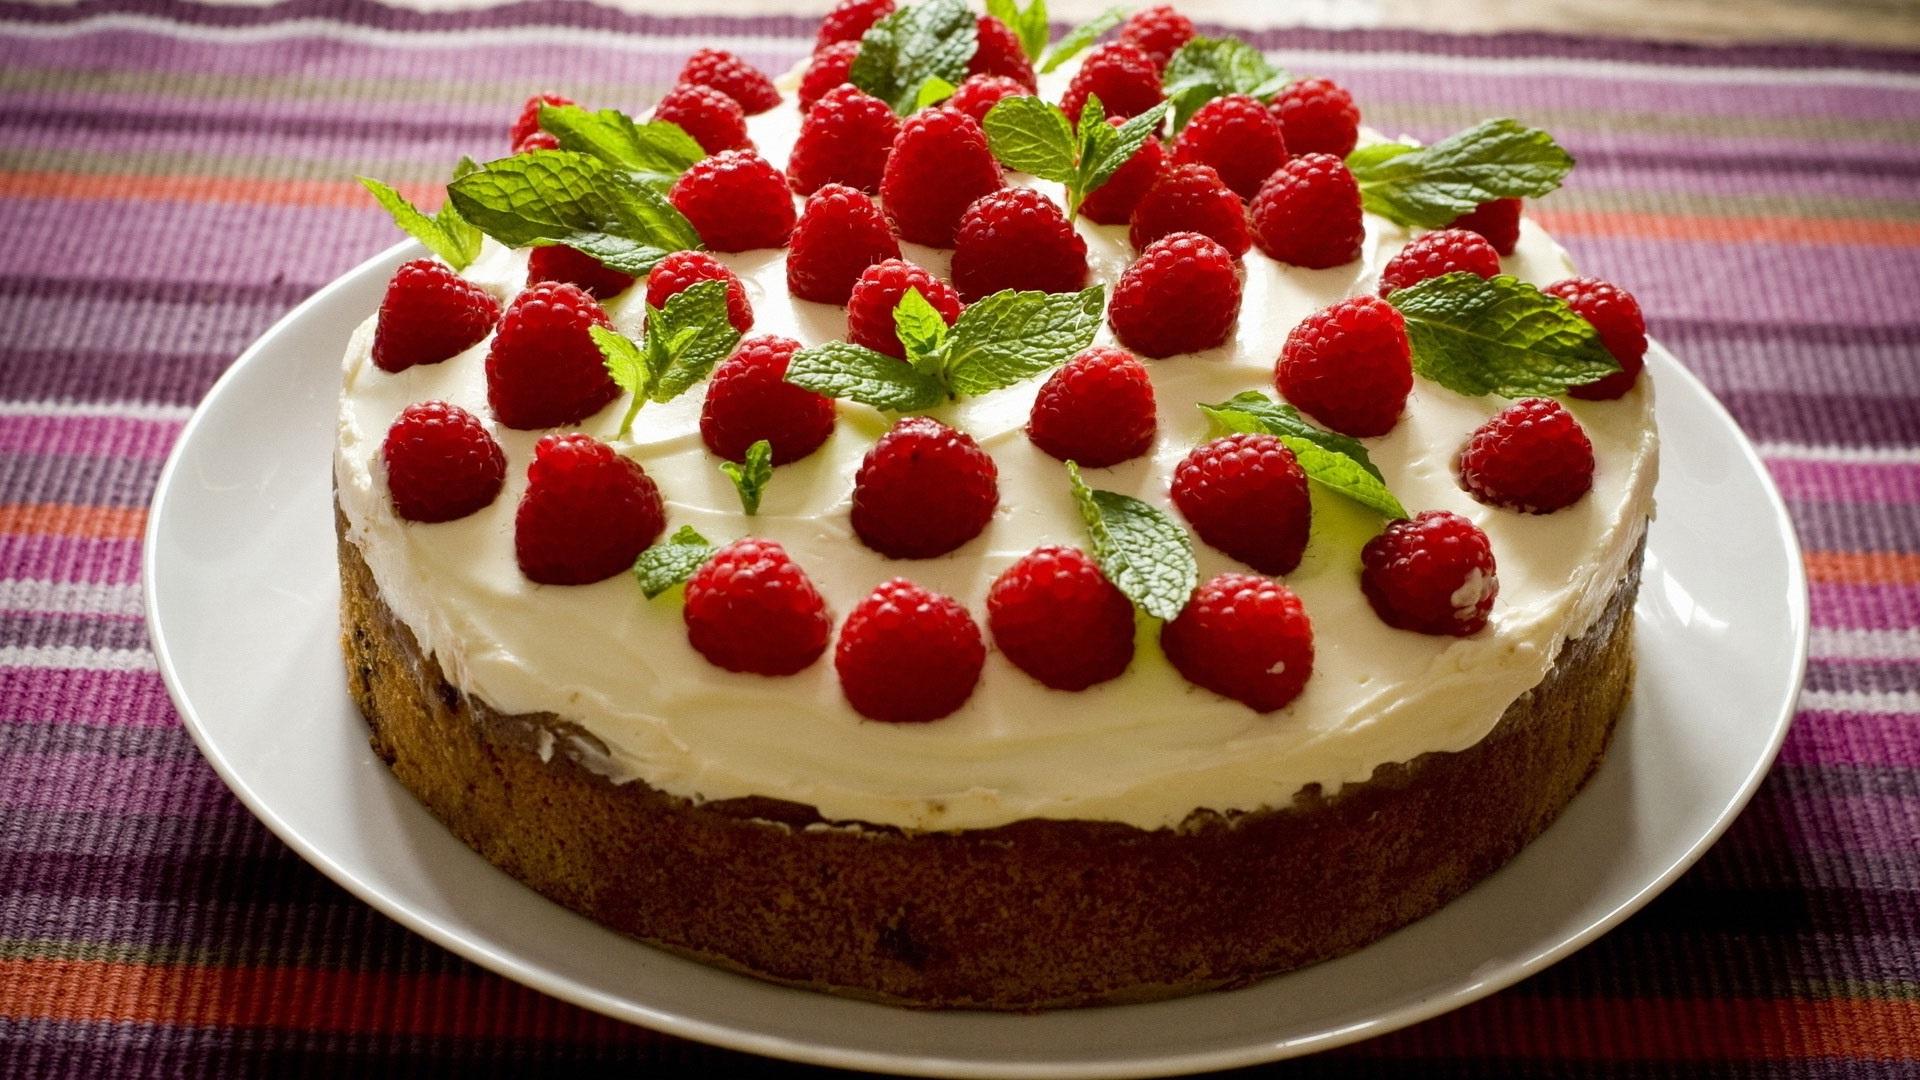 Wallpaper Raspberry Cake Cream Dessert 1920x1080 Full Hd 2k Picture Image